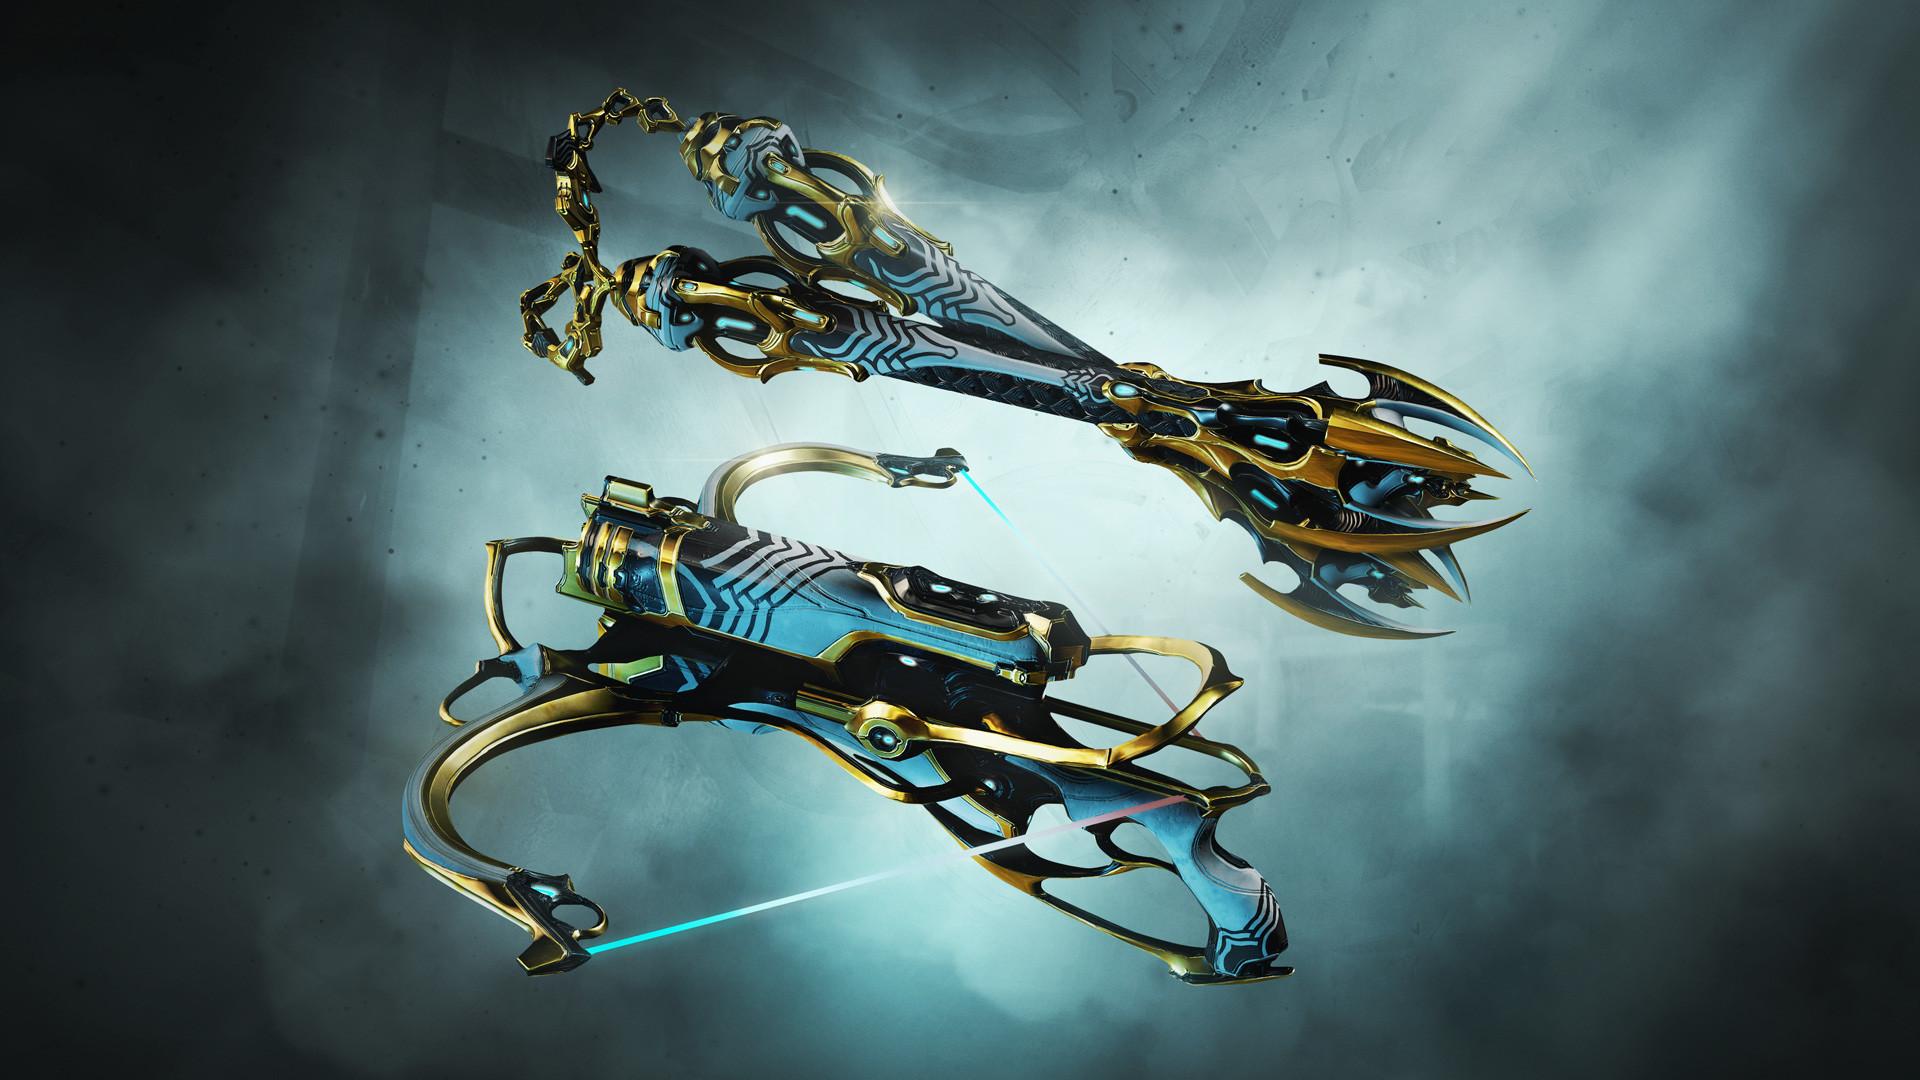 Wukong Prime: Primal Fury · Warframe Wukong Prime Access